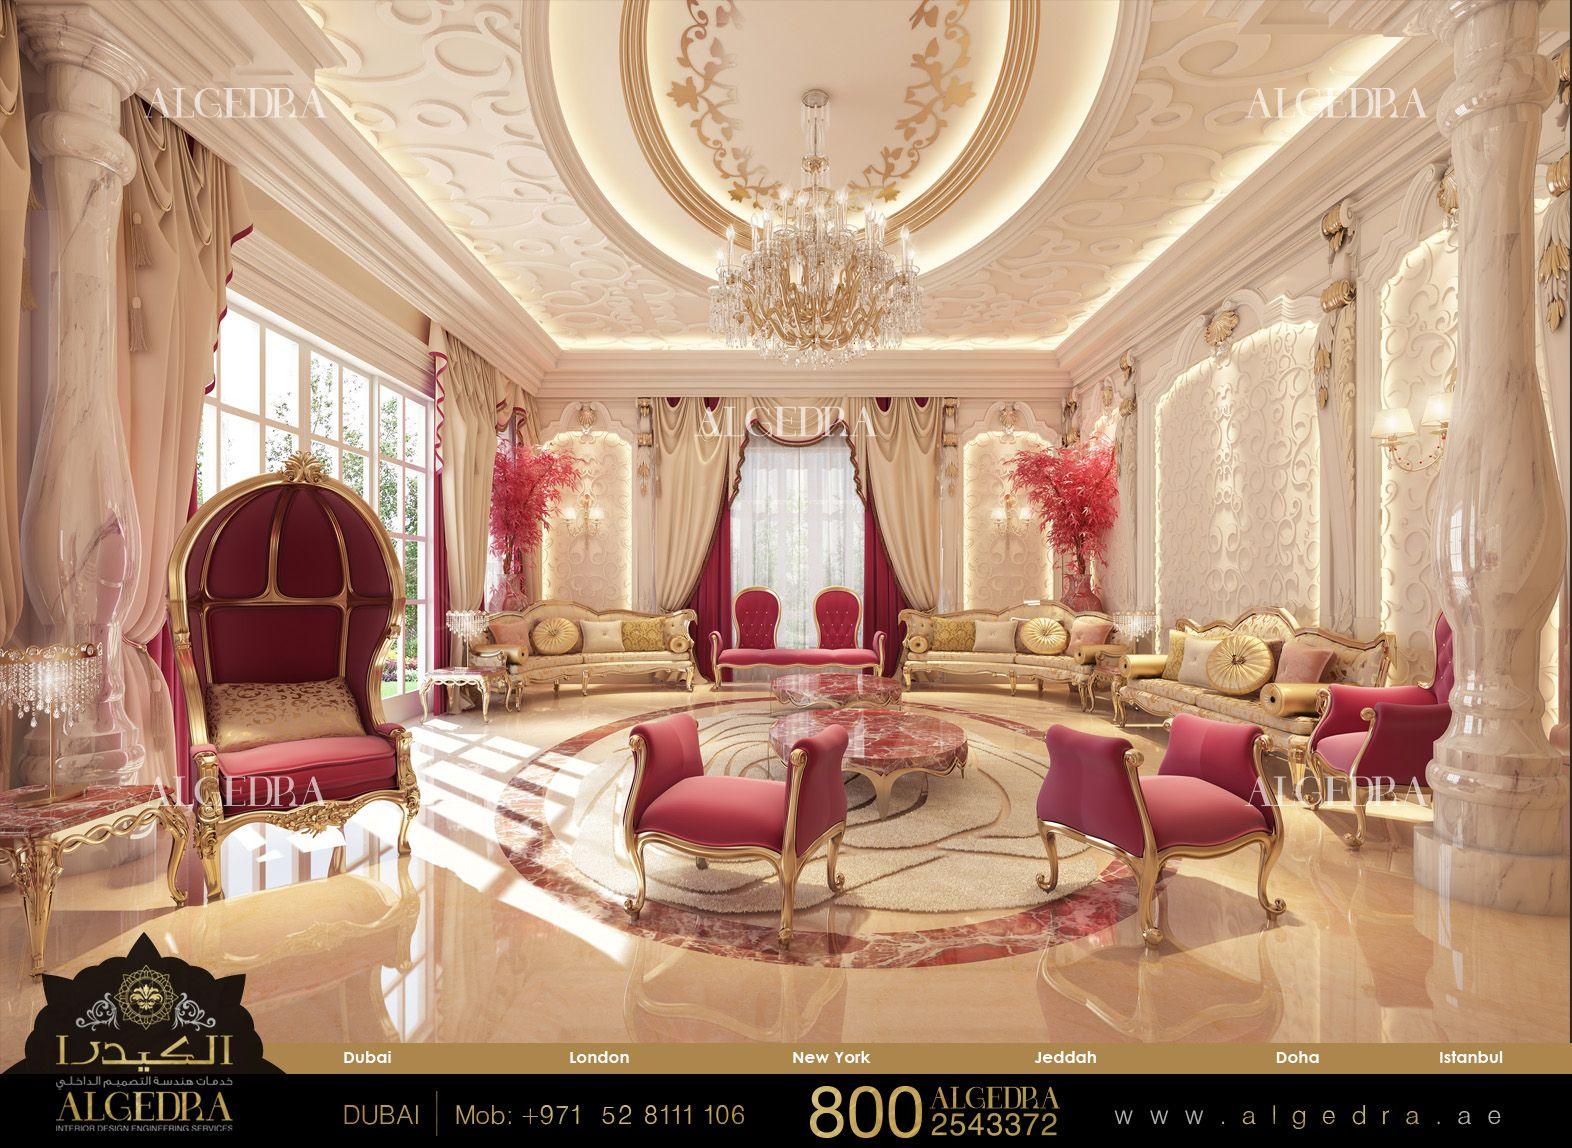 Luxurious Majlis Design By Algedra Interior Design Dubai Luxury Interior Design Luxury Villa Design